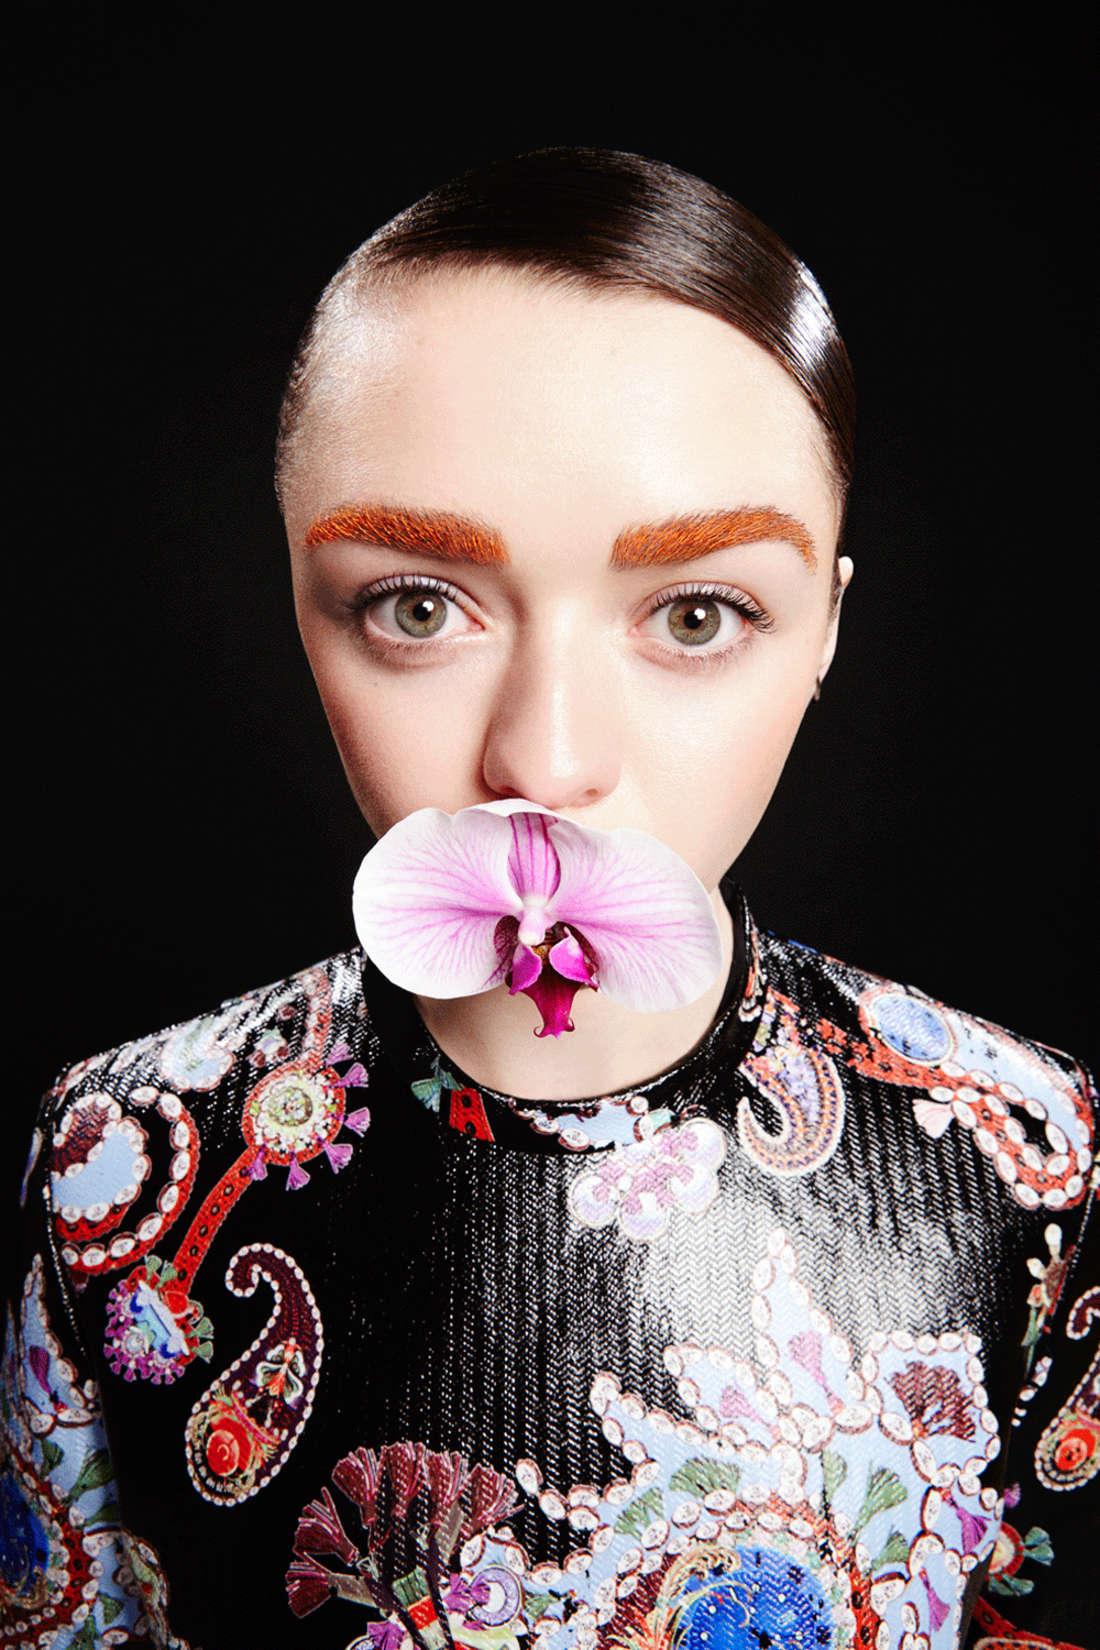 Maisie Williams 2015 : Maisie Williams: Evening Standard Photoshoot 2015 -02